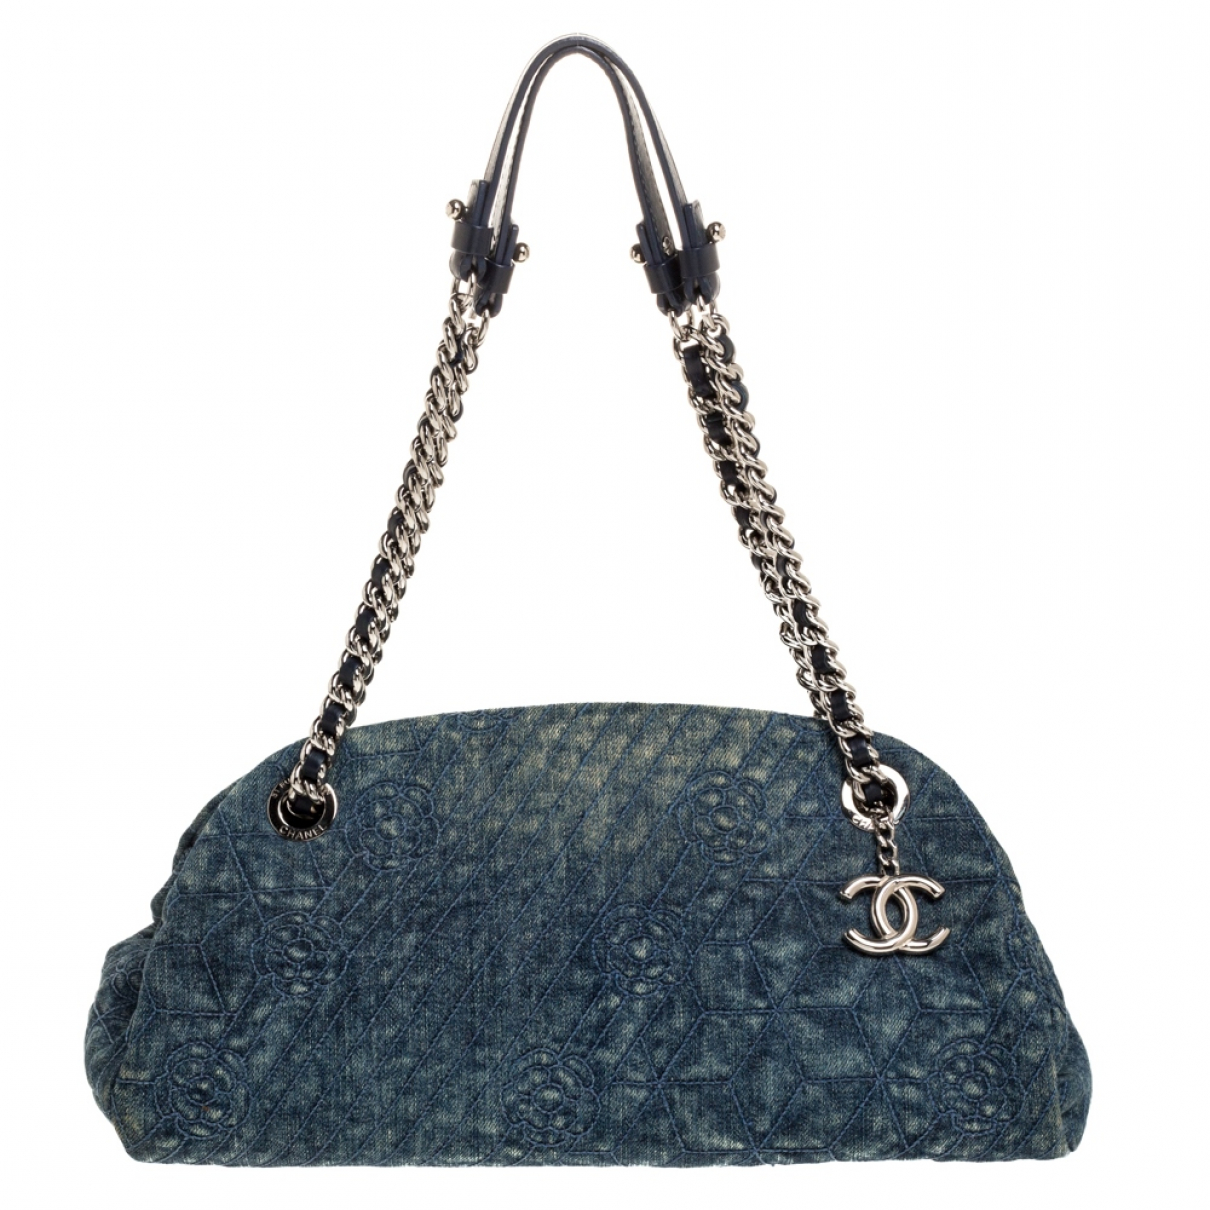 Chanel - Sac a main Mademoiselle pour femme en toile - bleu